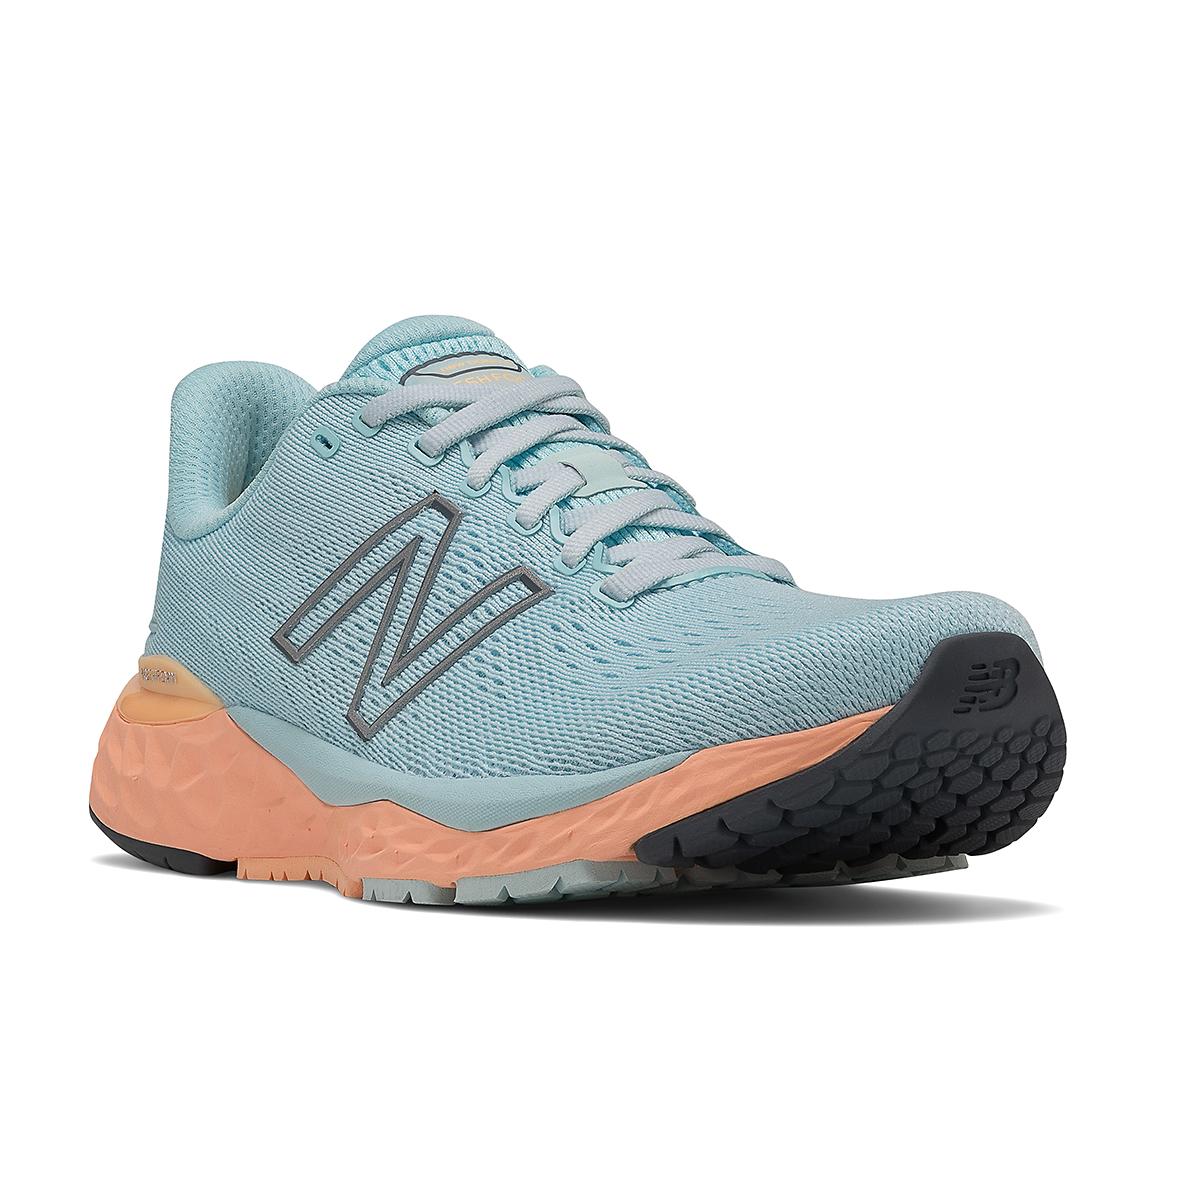 Women's New Balance 880V11 Running Shoe - Color: Pale Blue Chill/Light Mango - Size: 5 - Width: Narrow, Pale Blue Chill/Light Mango, large, image 3